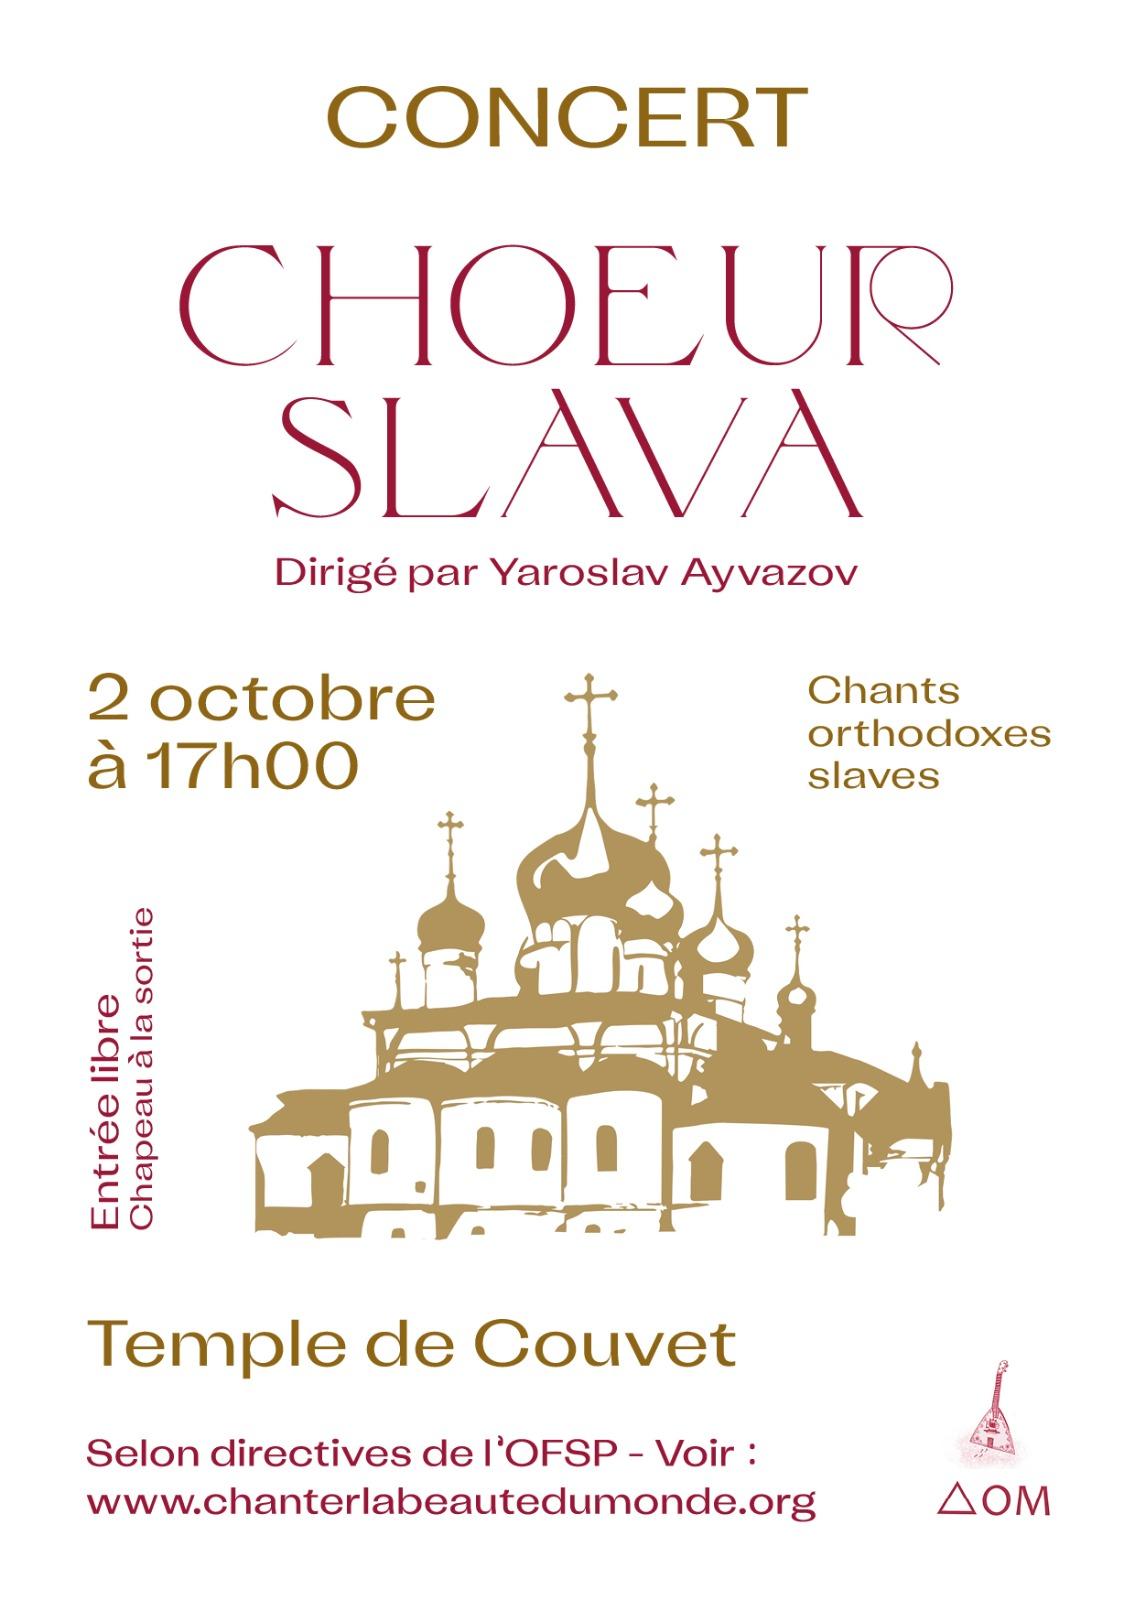 Concert Cœur Slava 2 octobre